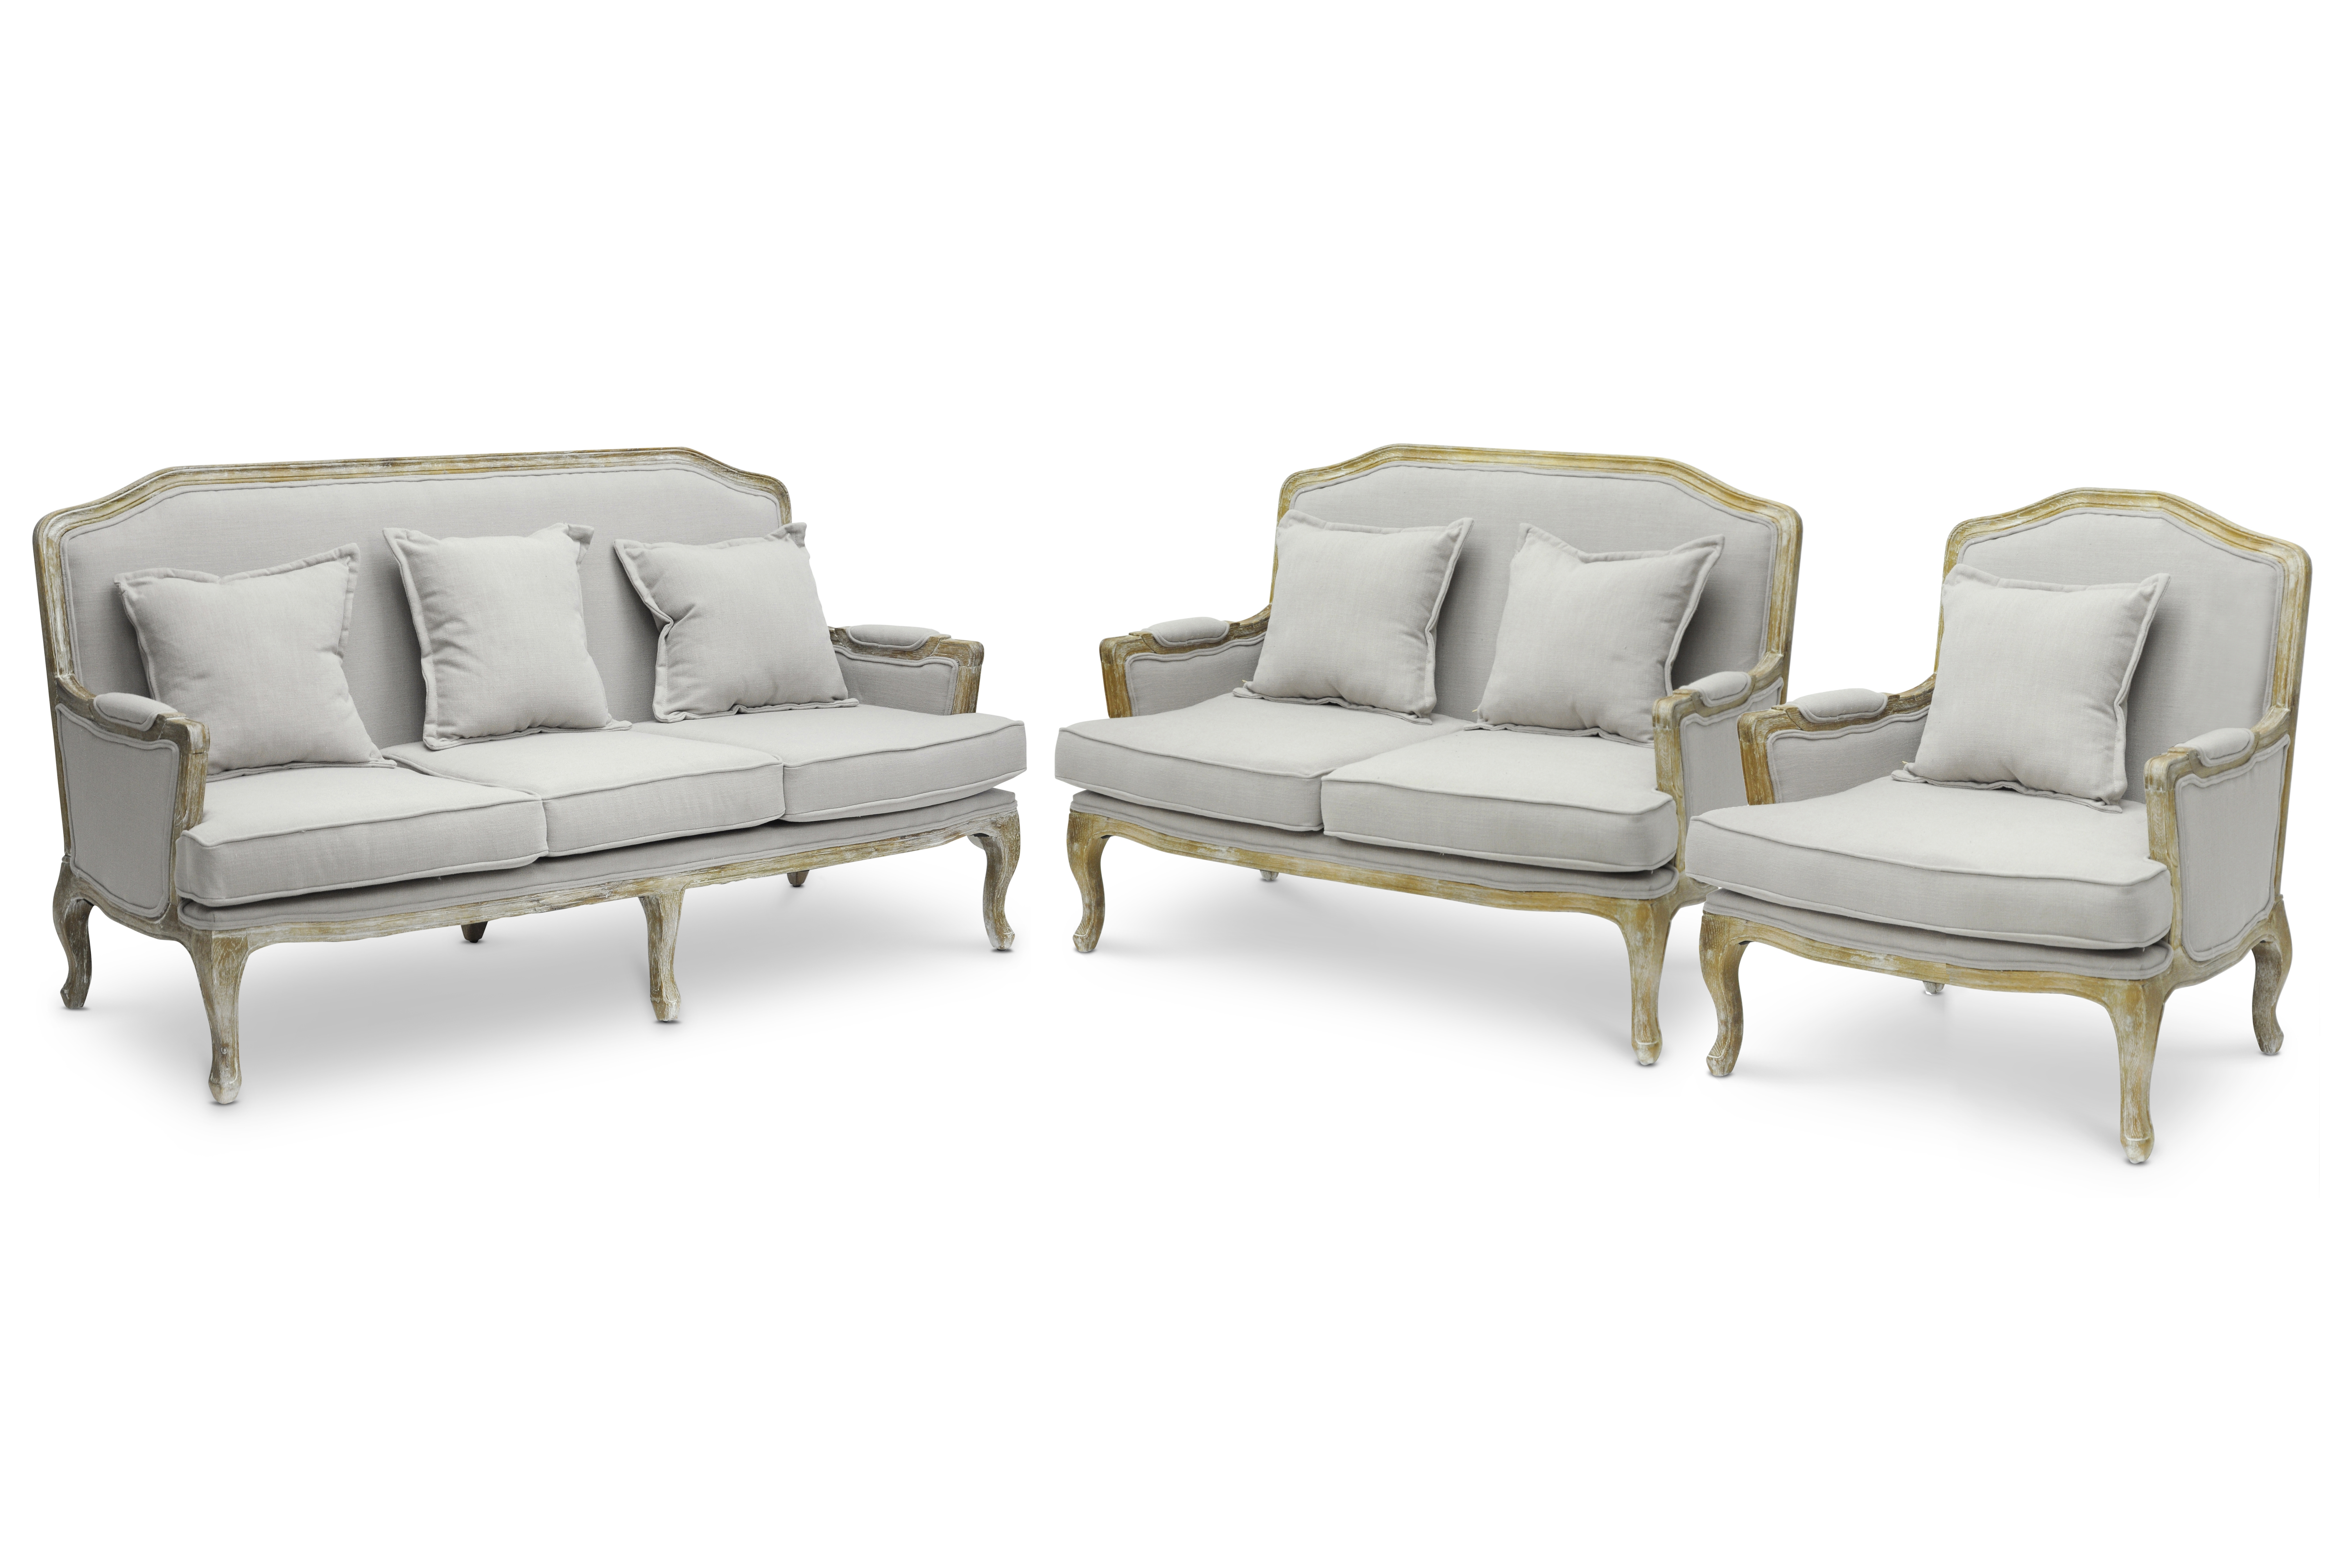 Baxton Studio Constanza Clic Antiqued French Sofa Set